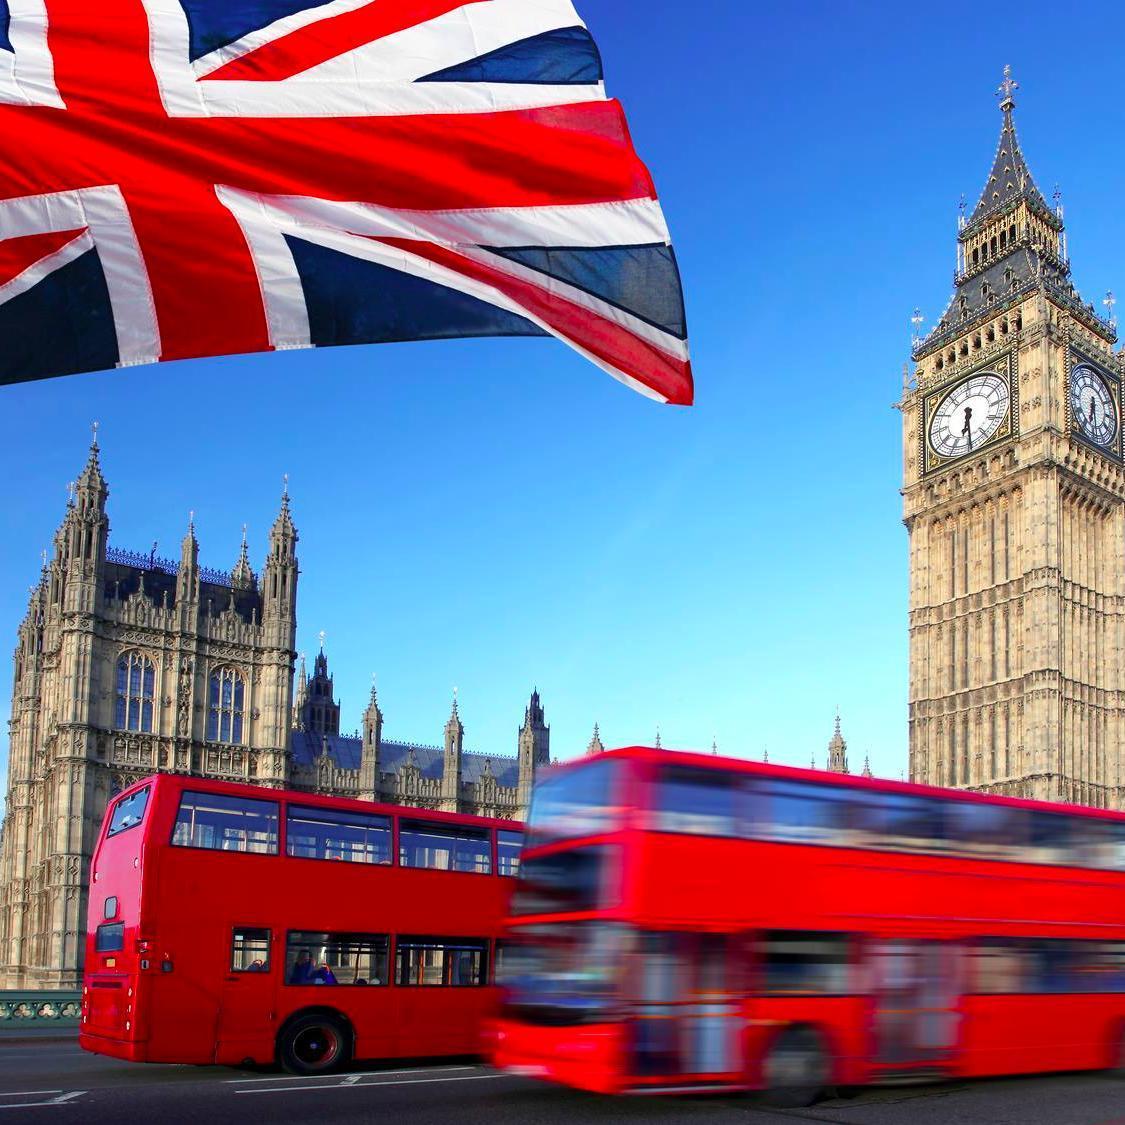 London Gratis At Londongratis Twitter